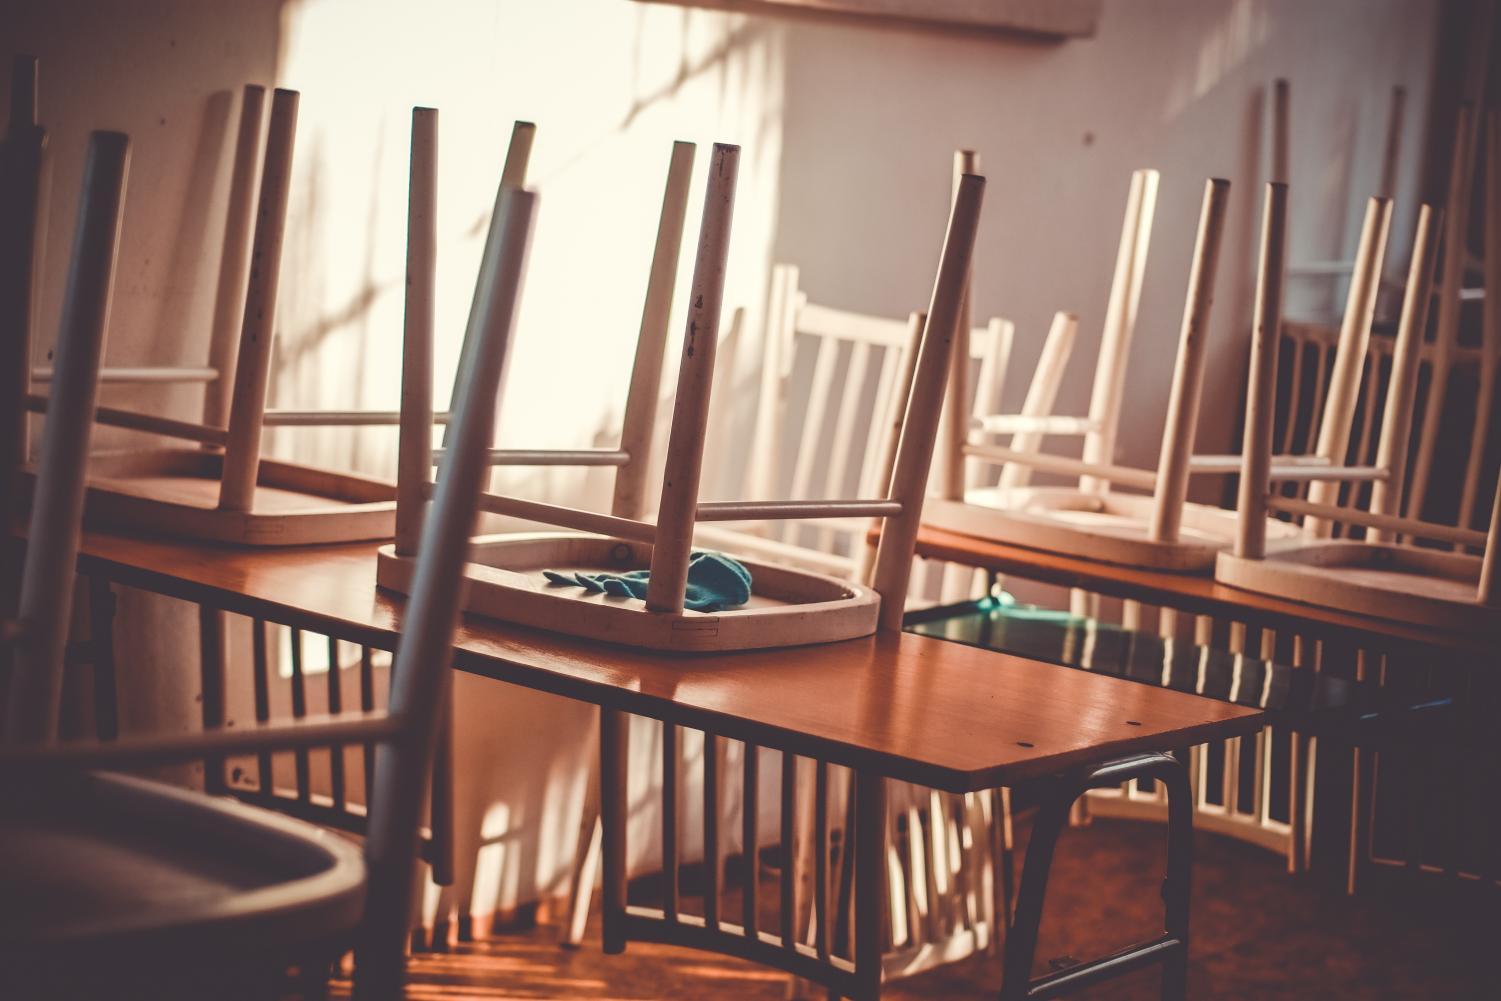 Hybrid Learning: The Kafkaesque Classroom